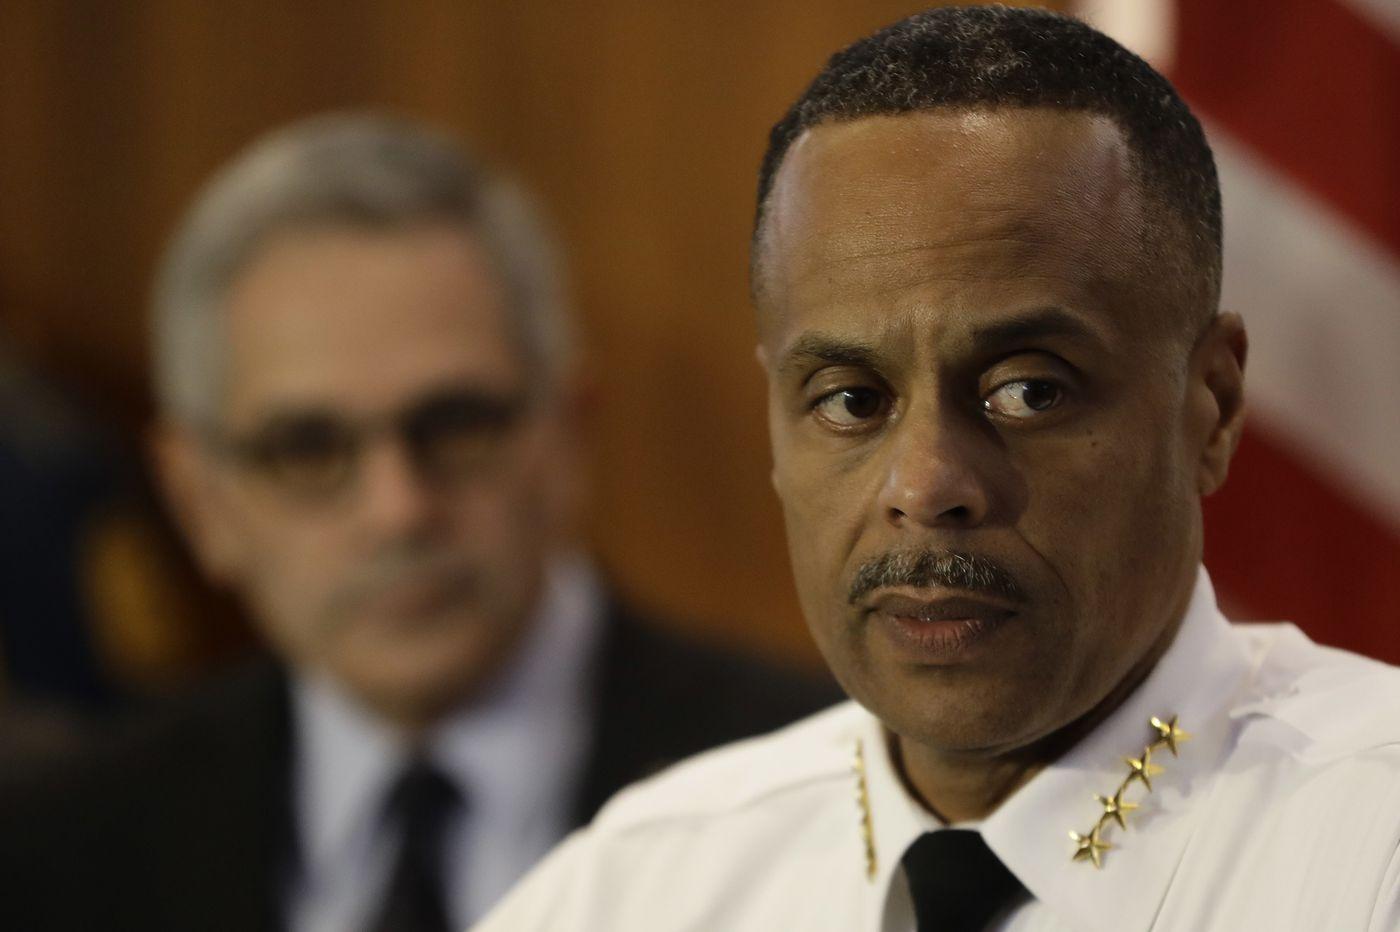 Drug killings fuel city's 2018 homicide uptick, officials say